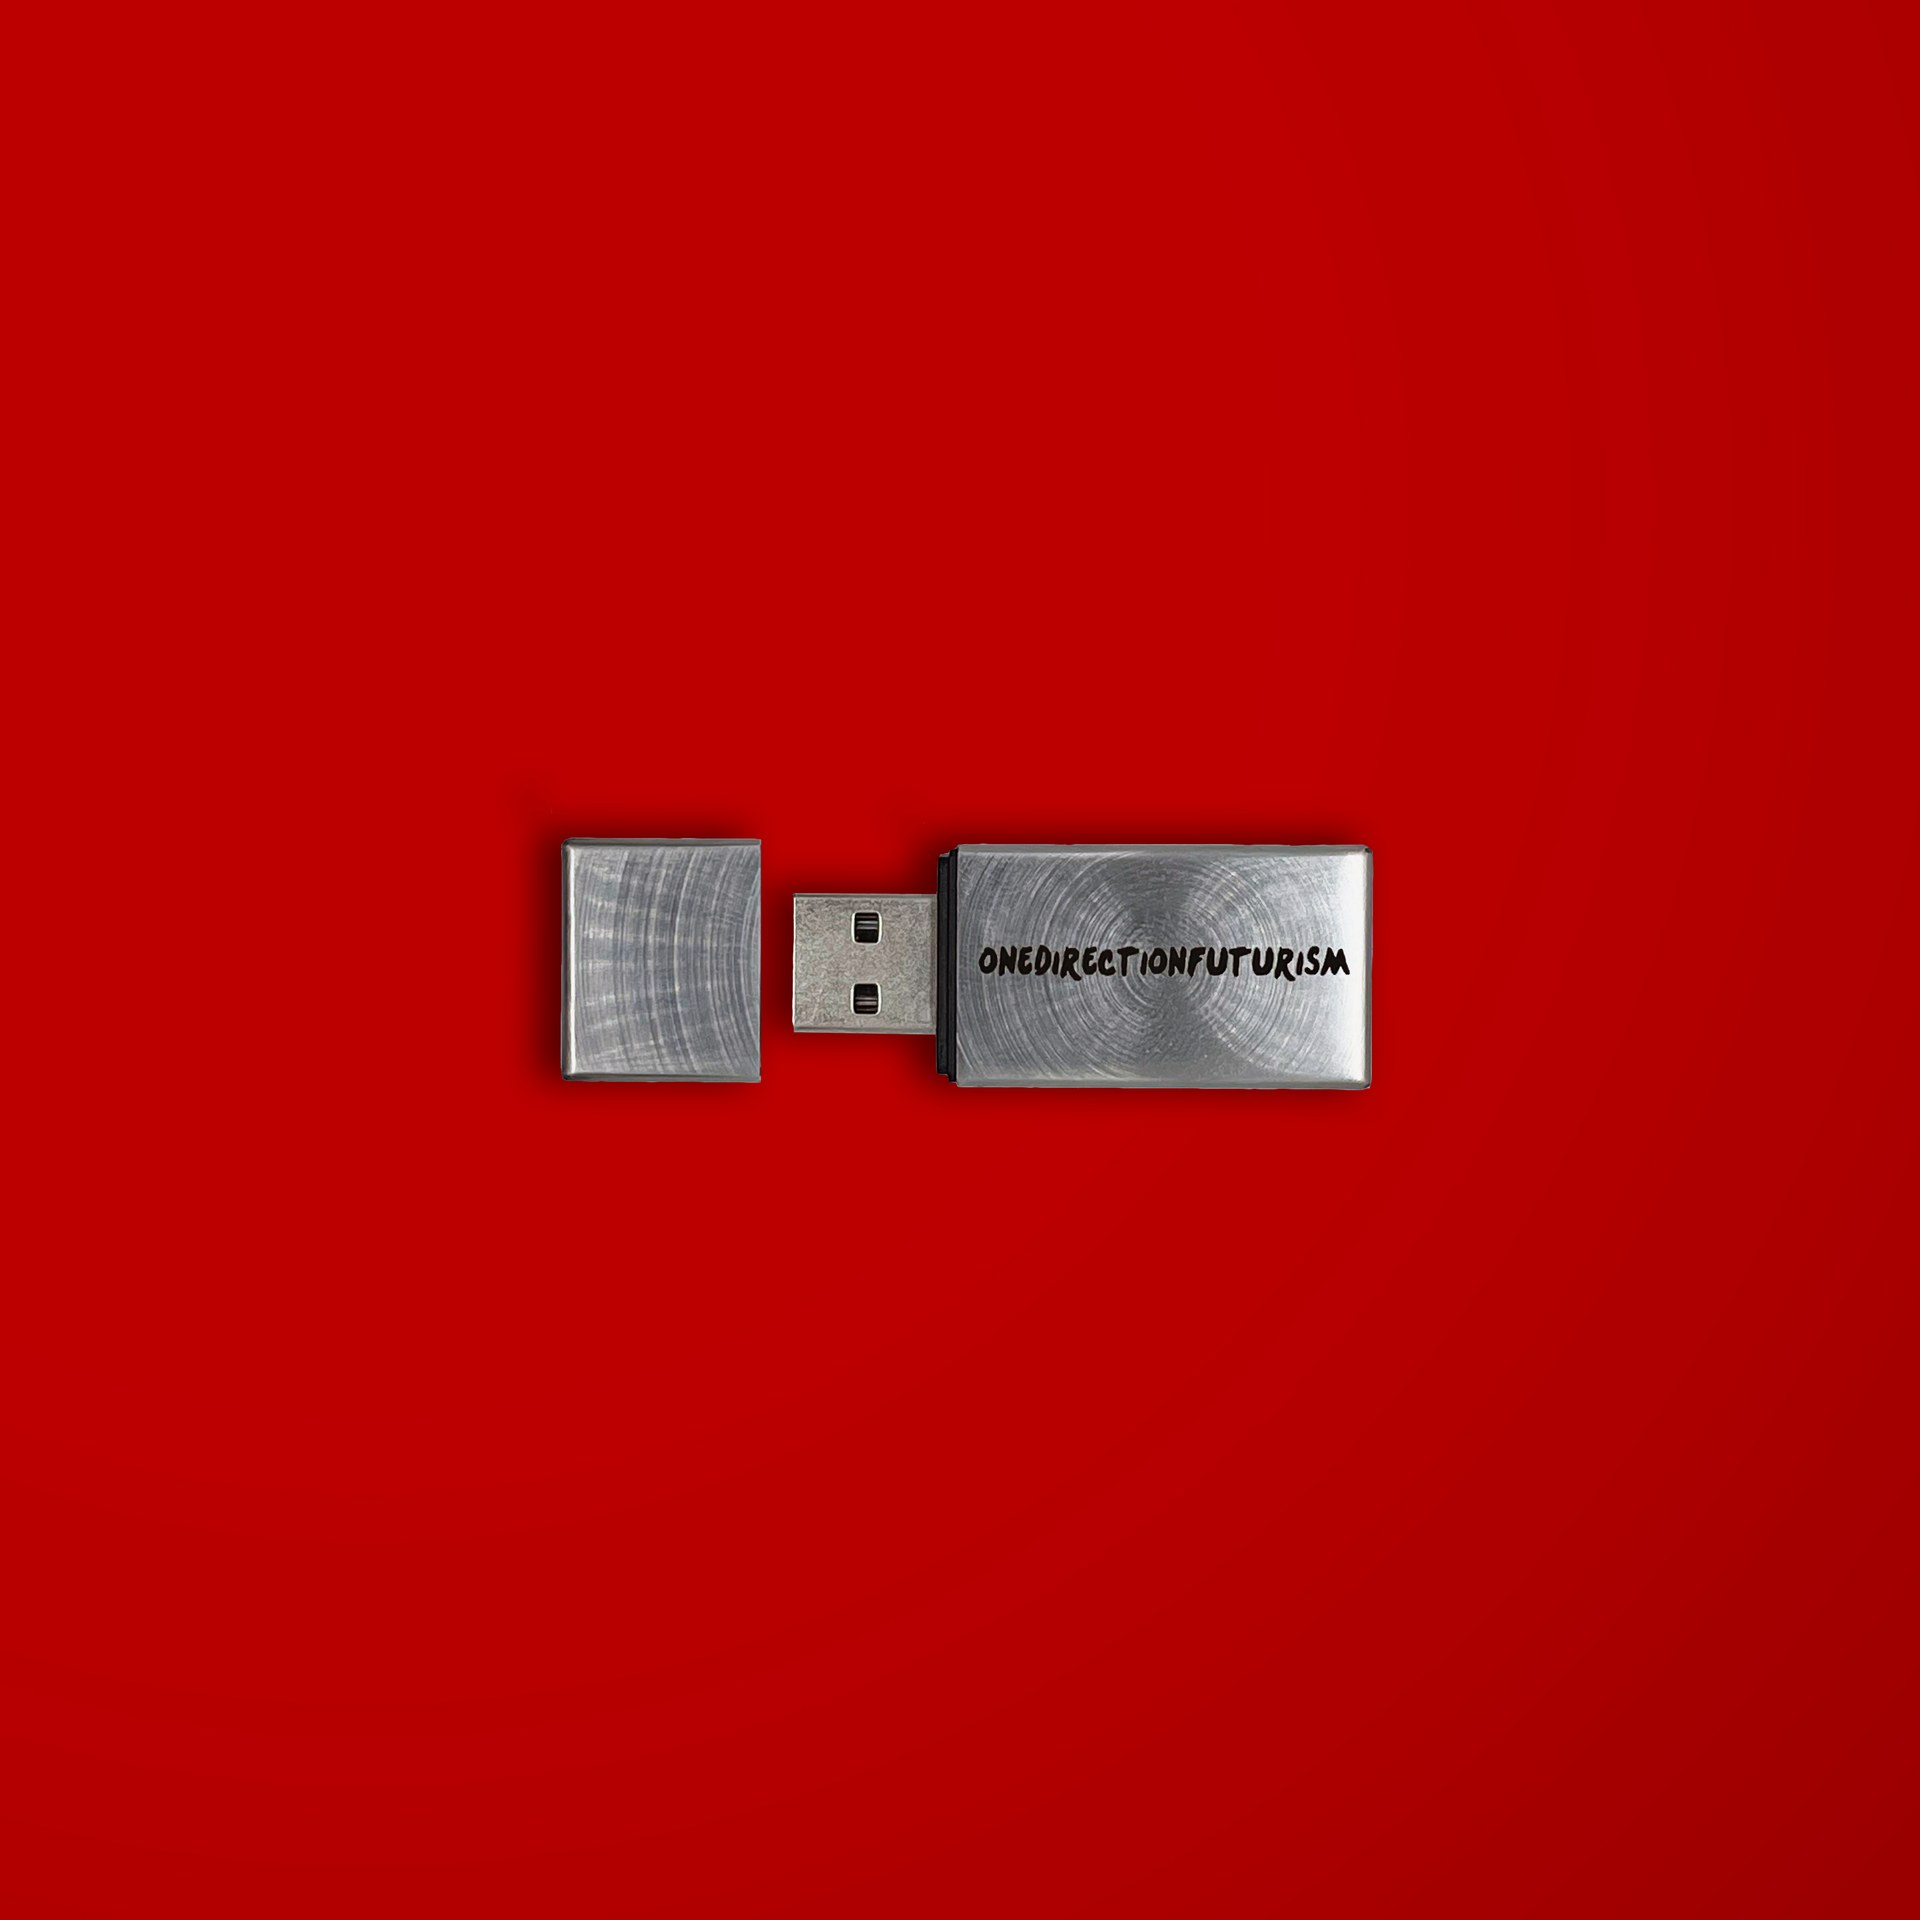 Onedirectionfuturism USB